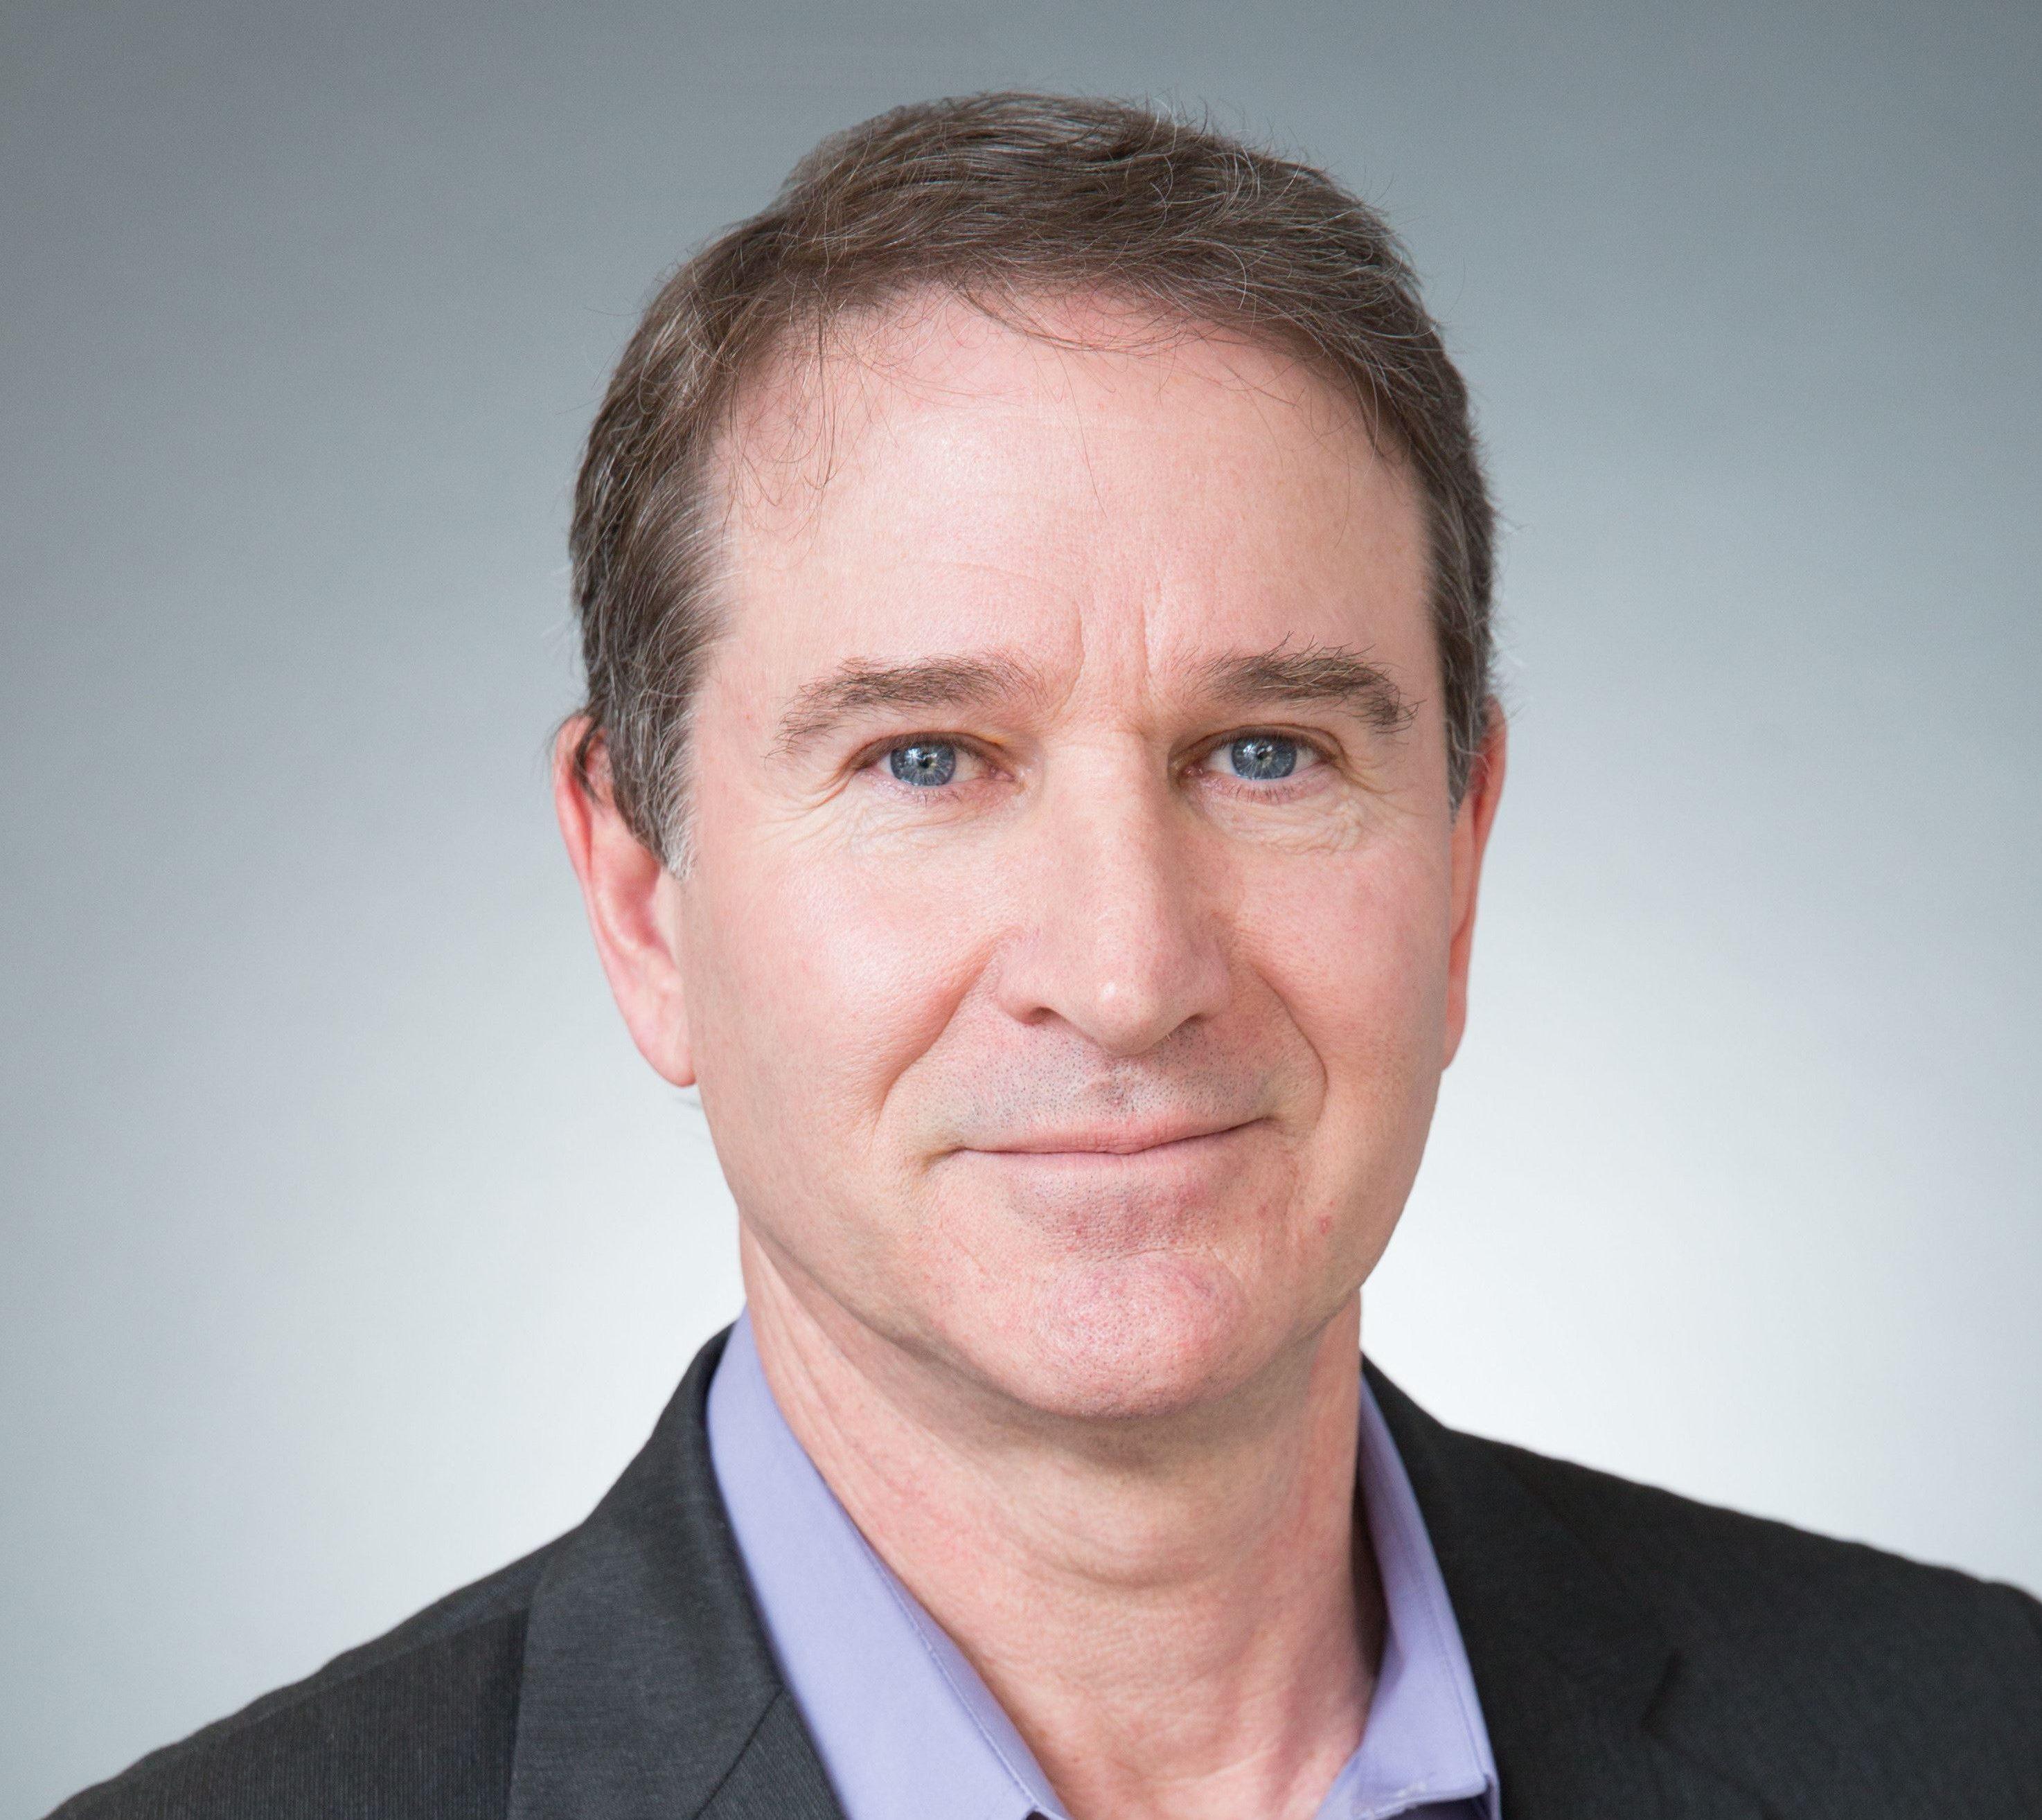 Mark Harris, senior vice president of marketing, The Uptime Institute. Photo courtesy of The Uptime Institute